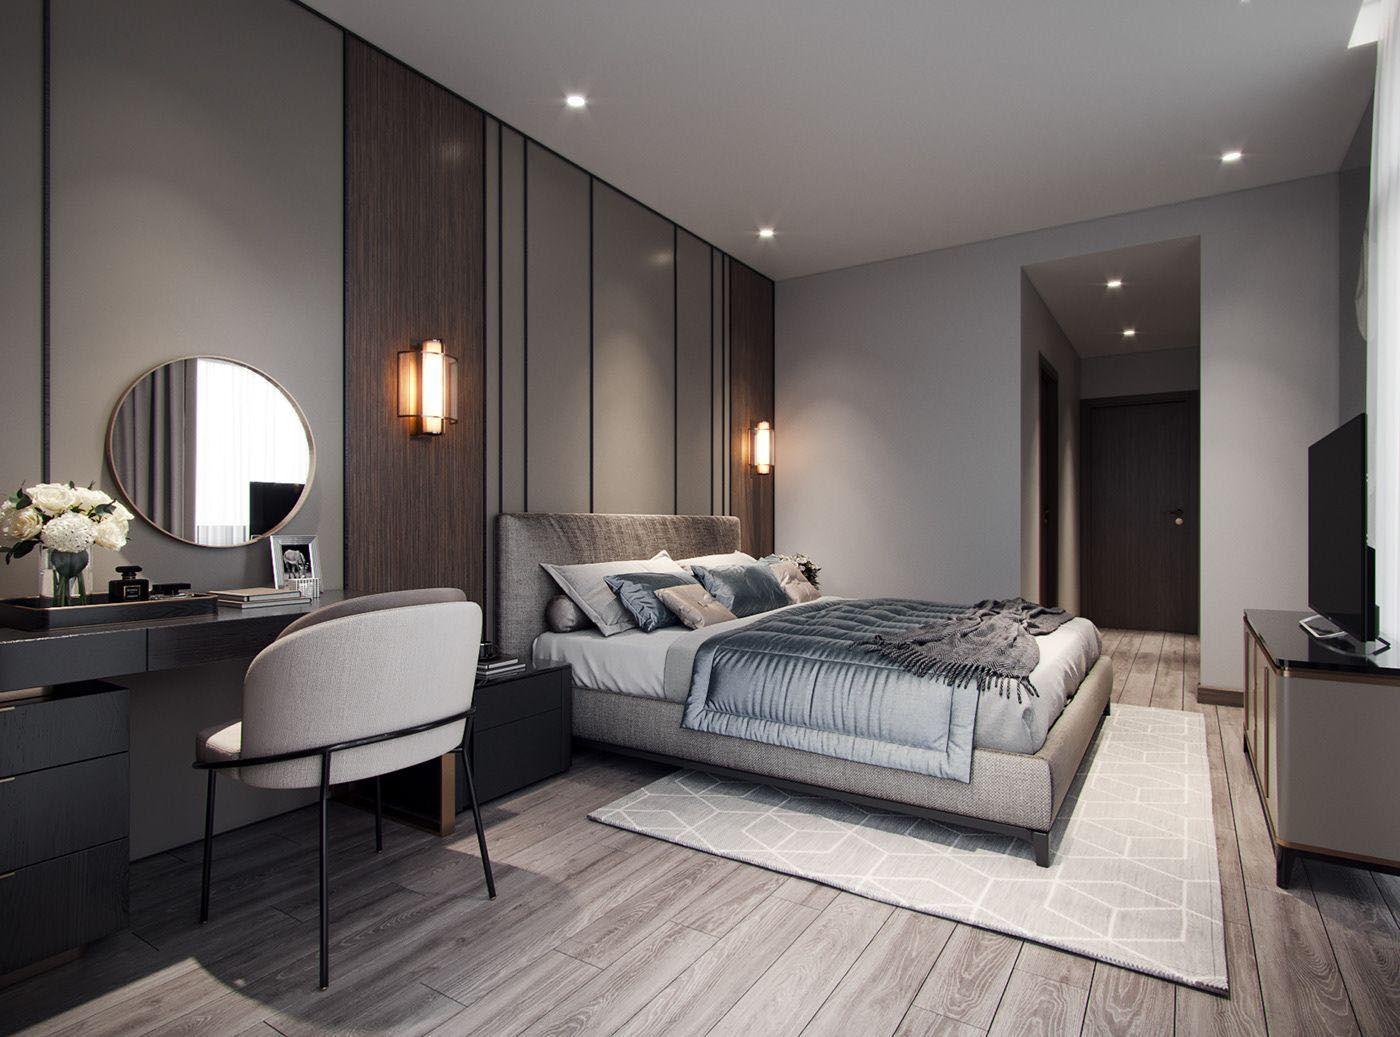 Enhance Your Senses With Luxury Home Decor Luxurious Bedrooms Apartment Interior Design Apartment Interior